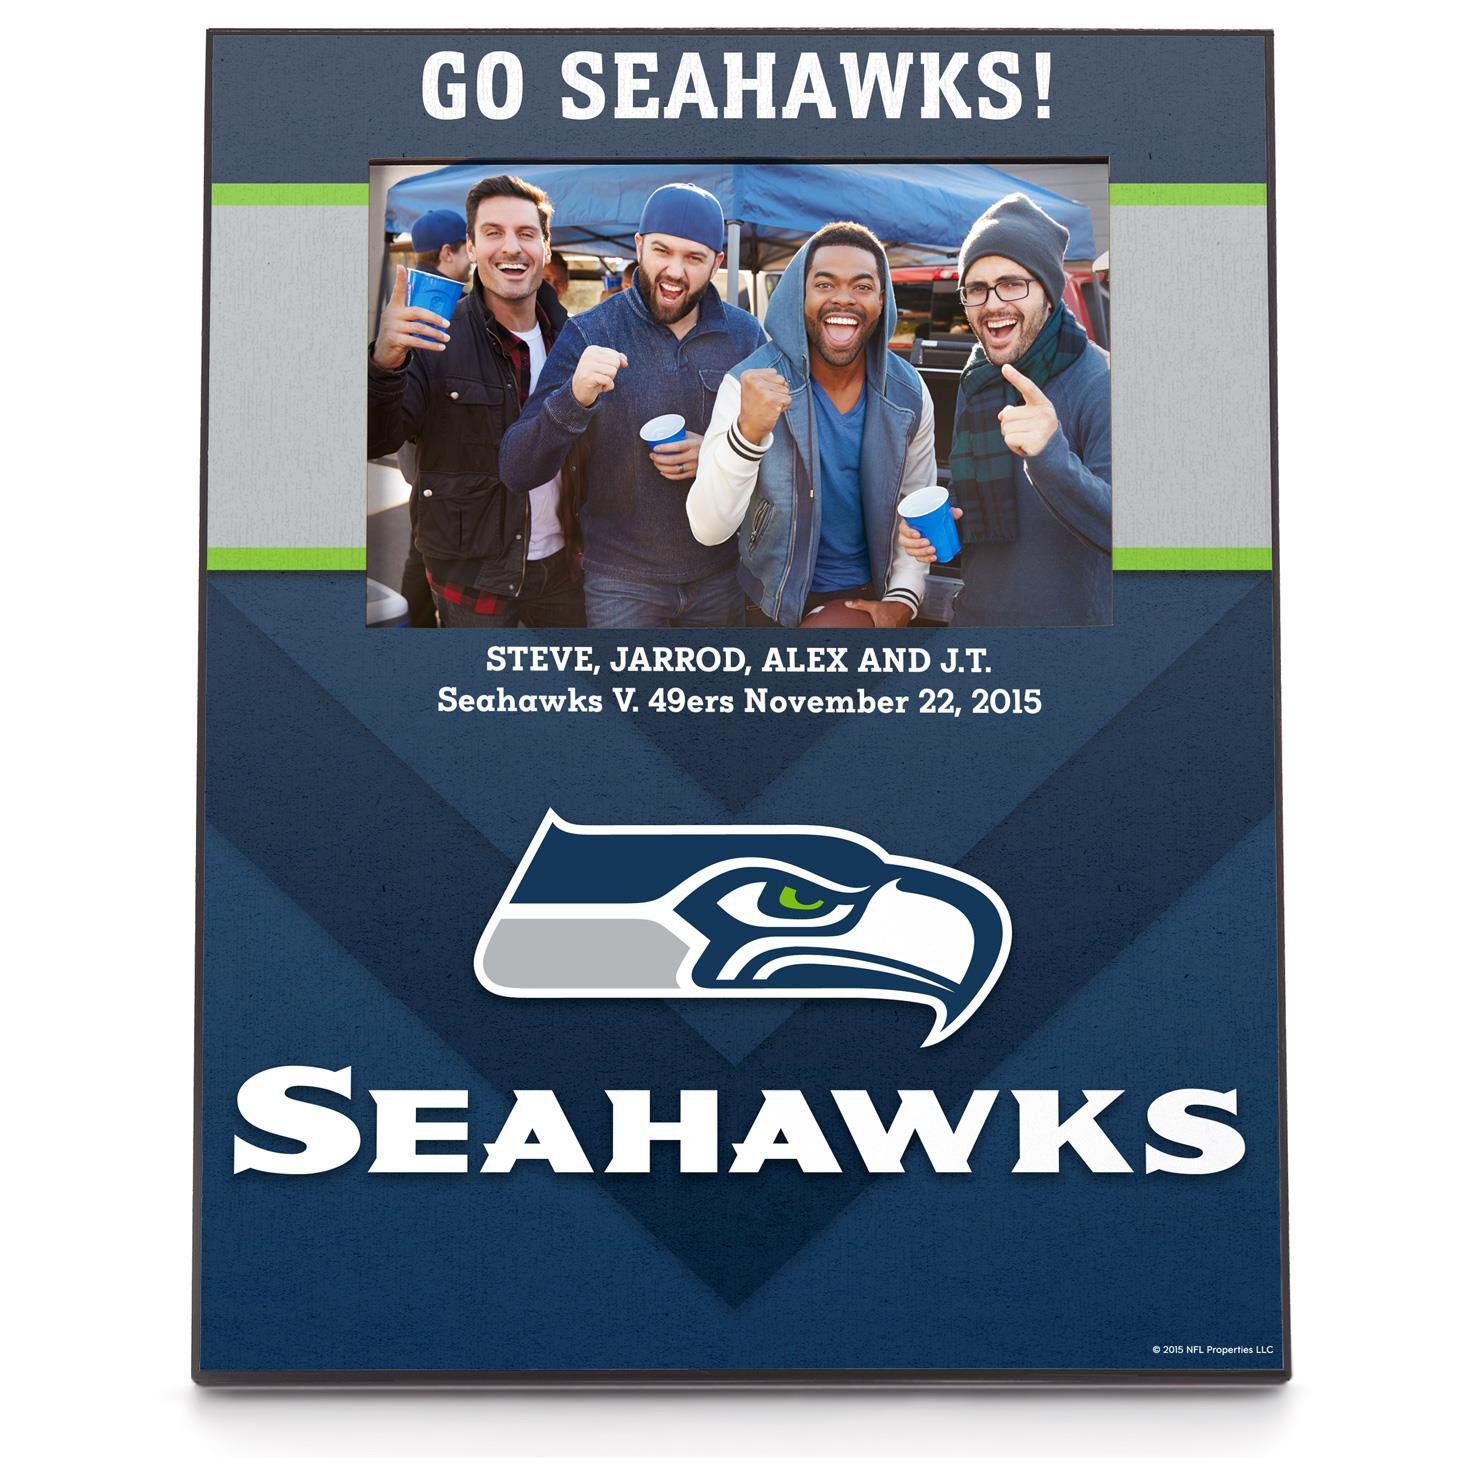 Seattle seahawks personalized 4x6 photo frame personalized home seattle seahawks personalized 4x6 photo frame personalized home decor hallmark jeuxipadfo Choice Image